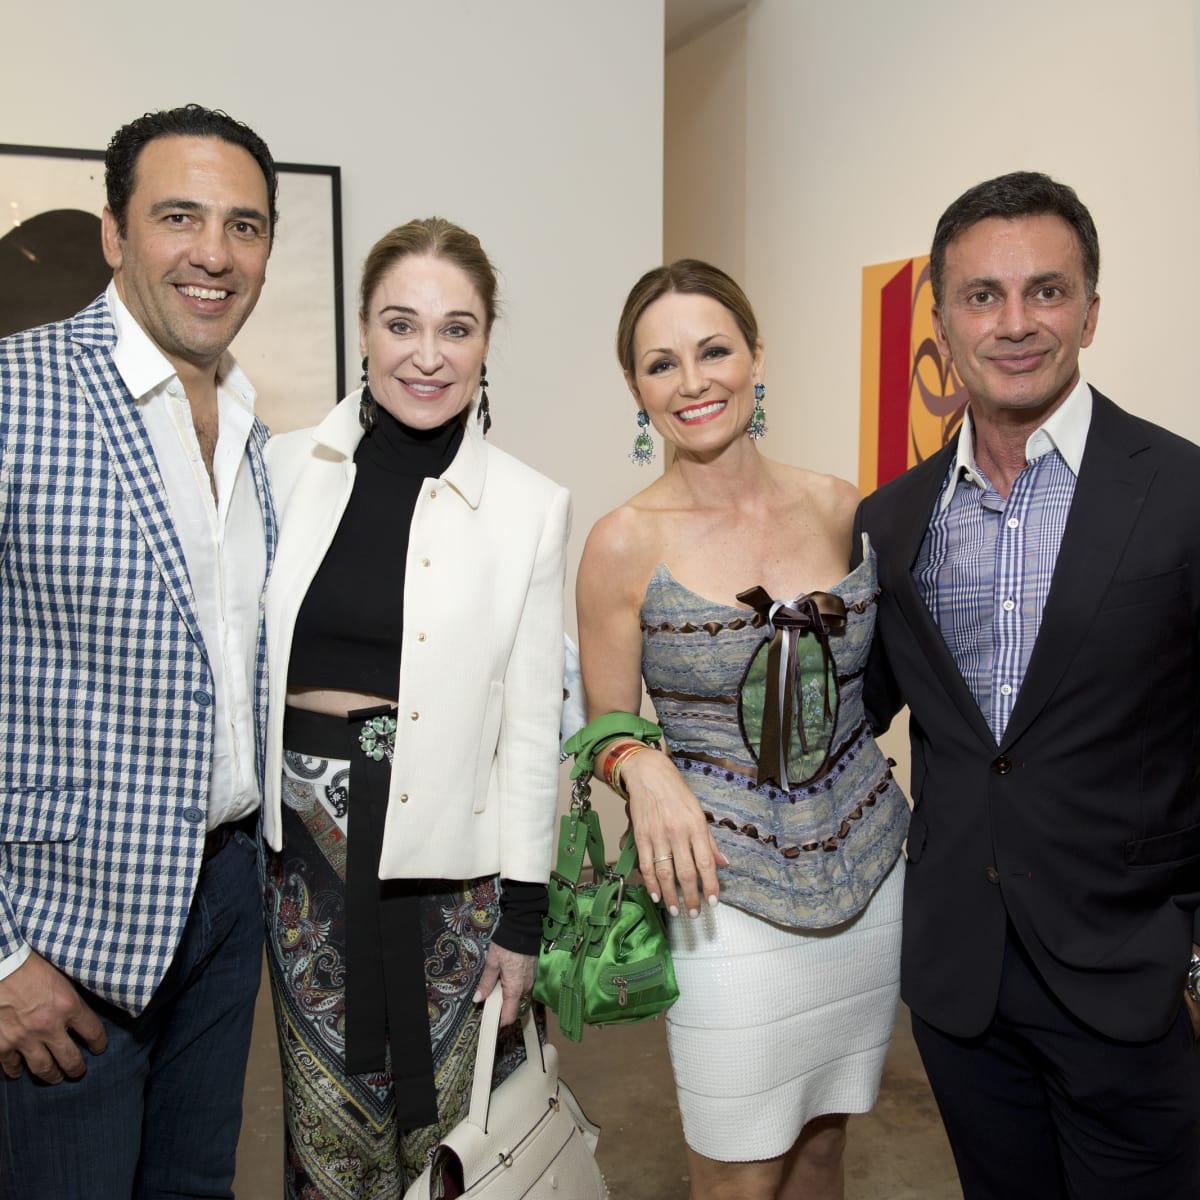 UNICEF Art Auction, 5/16  Javier Loya, Becca Cason Thrash, Lucinda Loya, Monsour Taghdisi